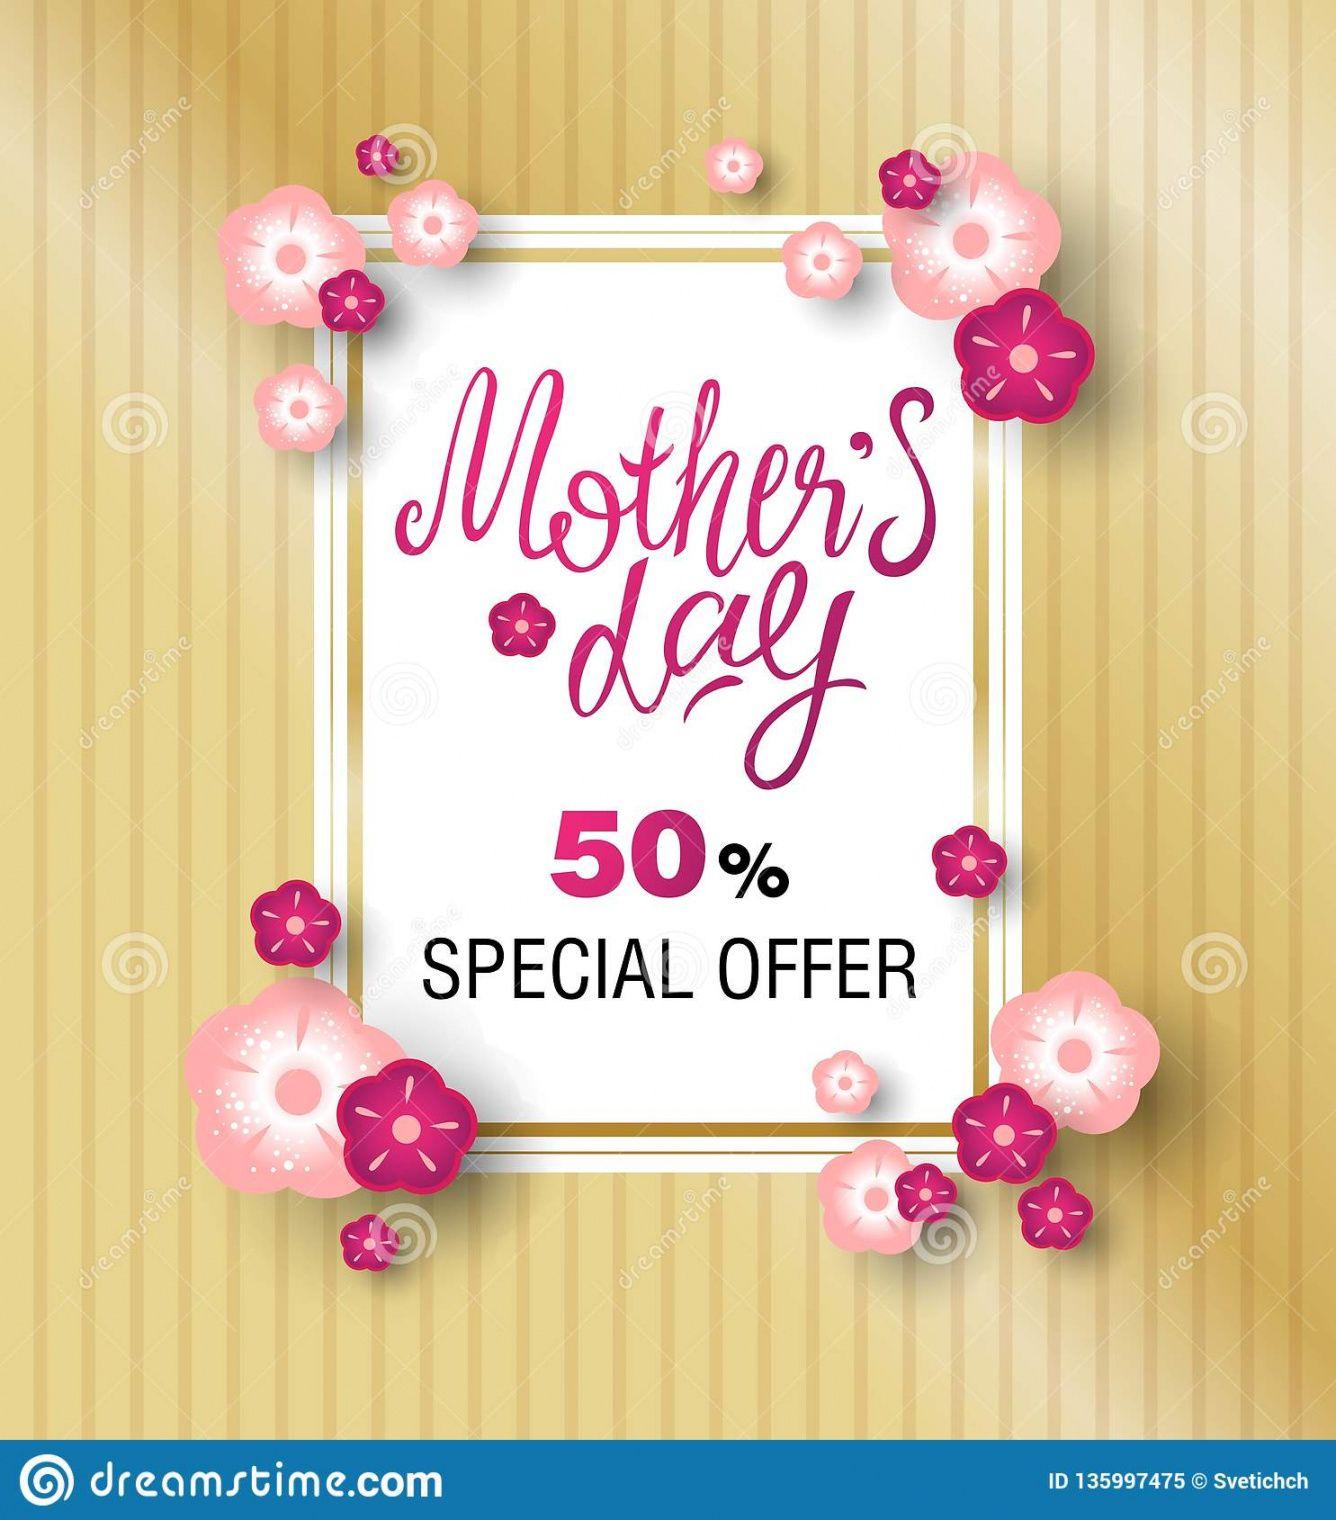 printable template design sale banner for happy mothers day stock mothers day banner template